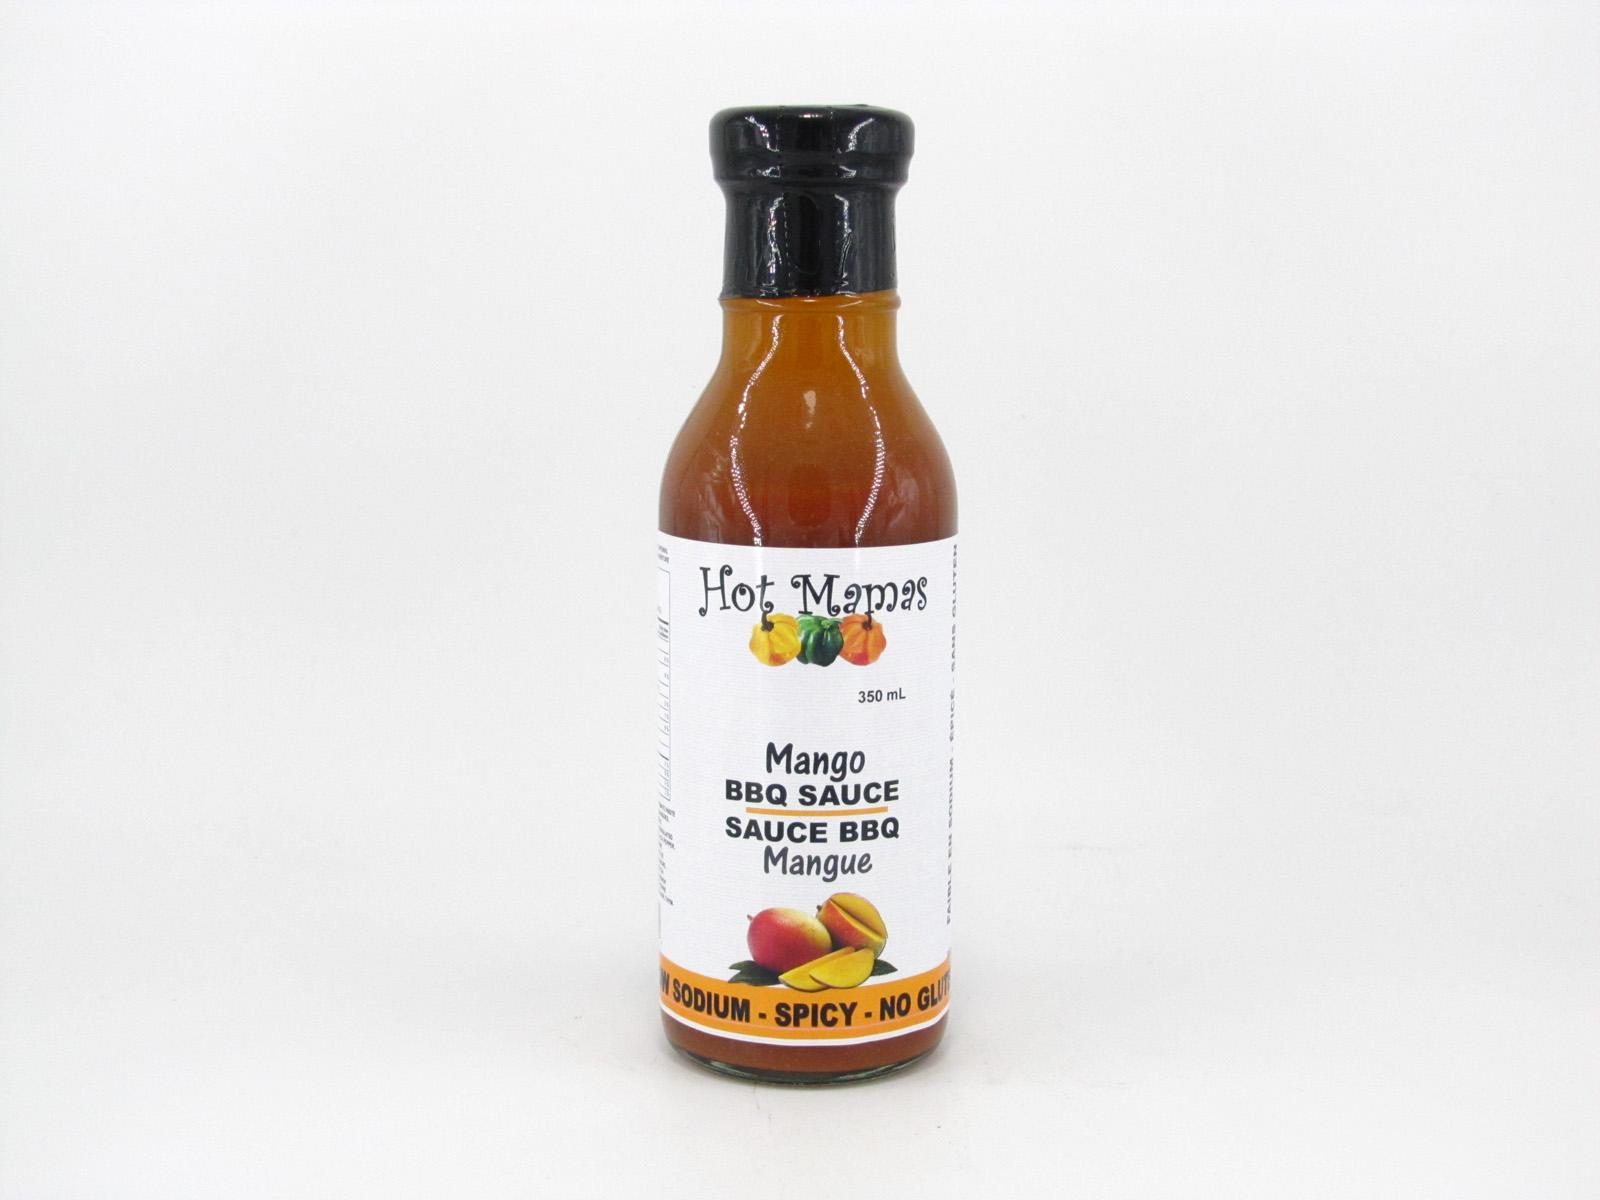 Hot Mamas - Mango Mango BBQ Sauc - front view